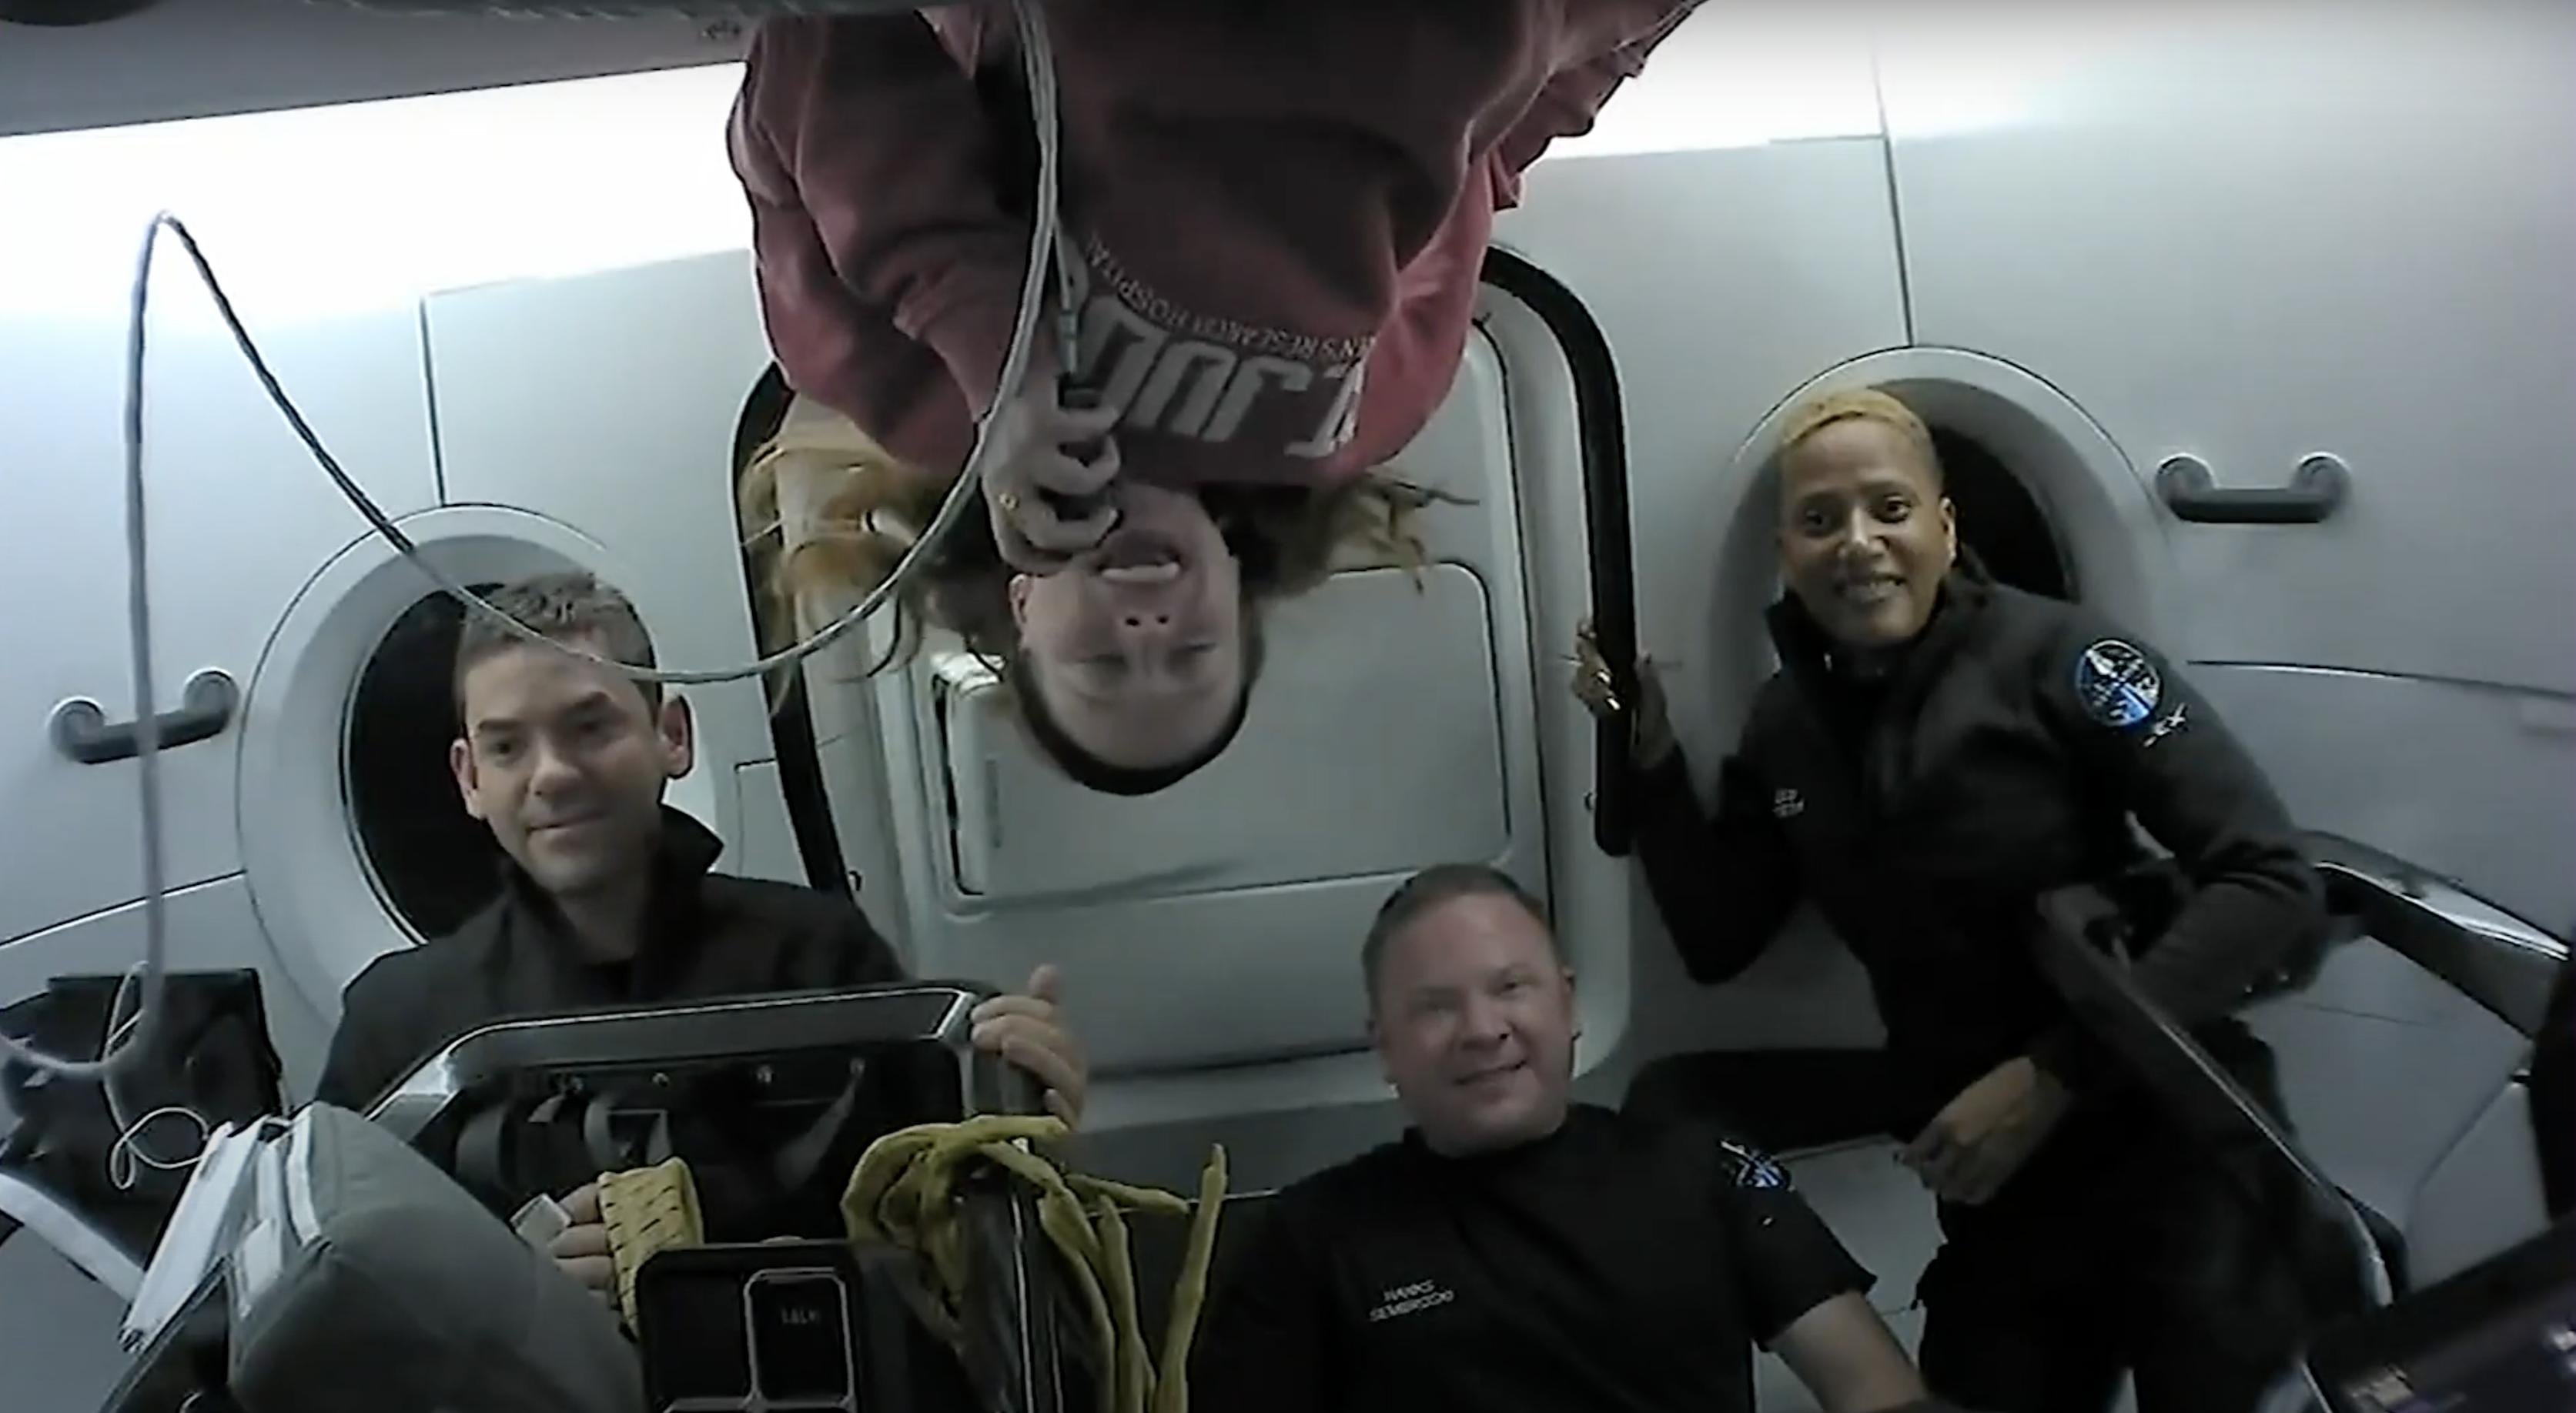 Inspiration4 Crew in orbit speaking with St. Jude patients.